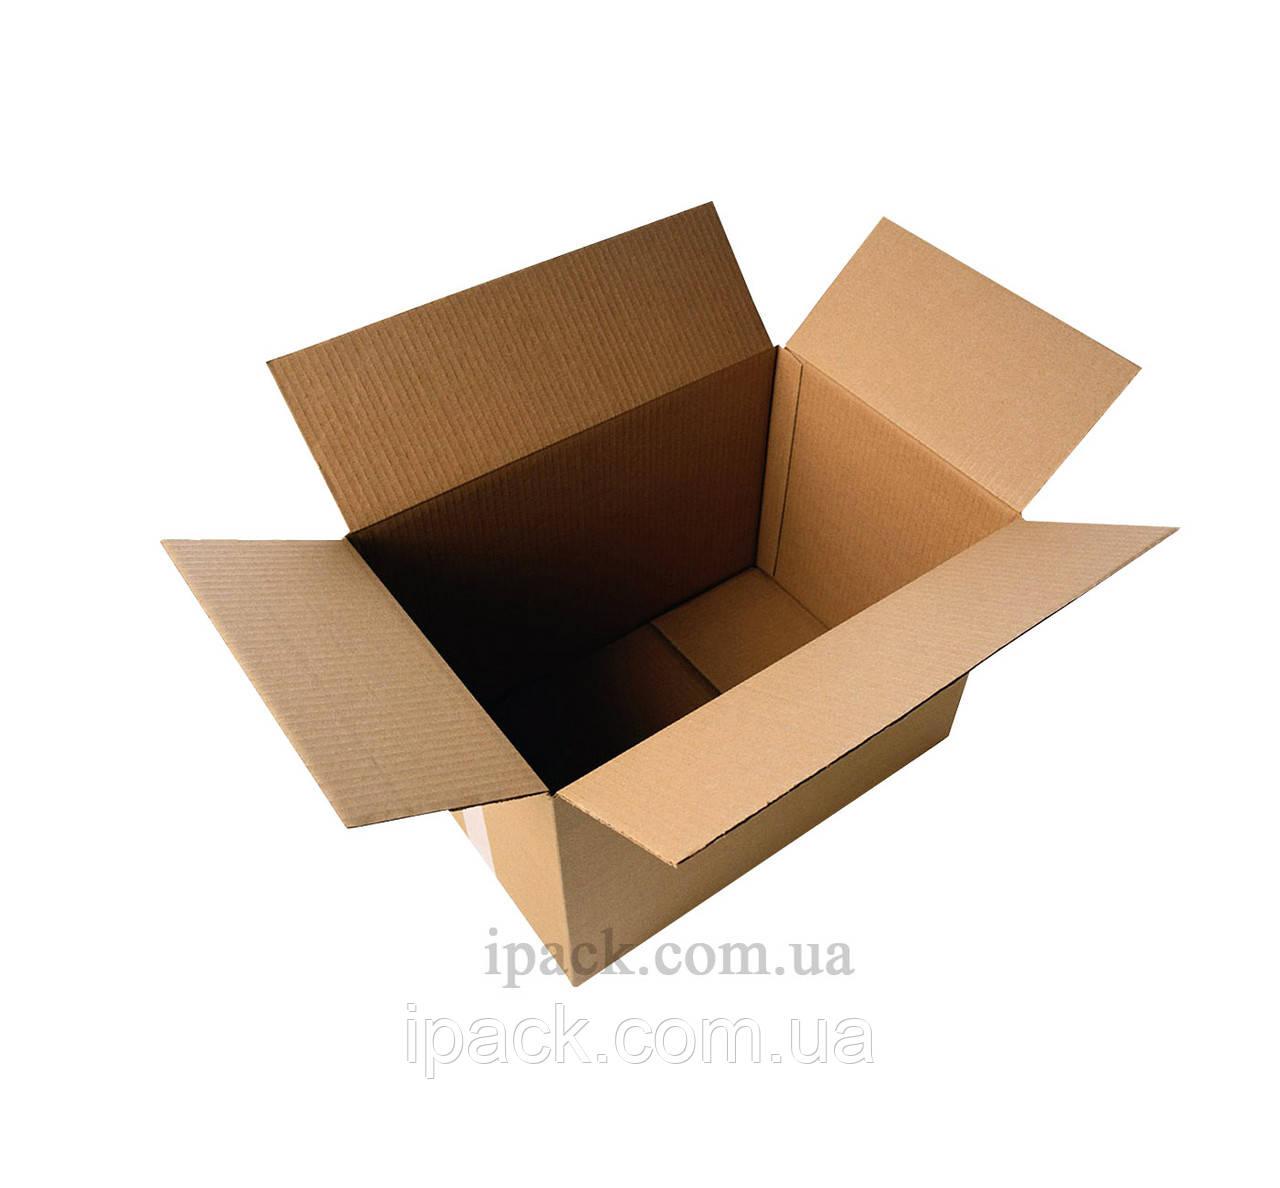 Гофроящик 255*190*295 мм, бурый, четырехклапанный картонный короб